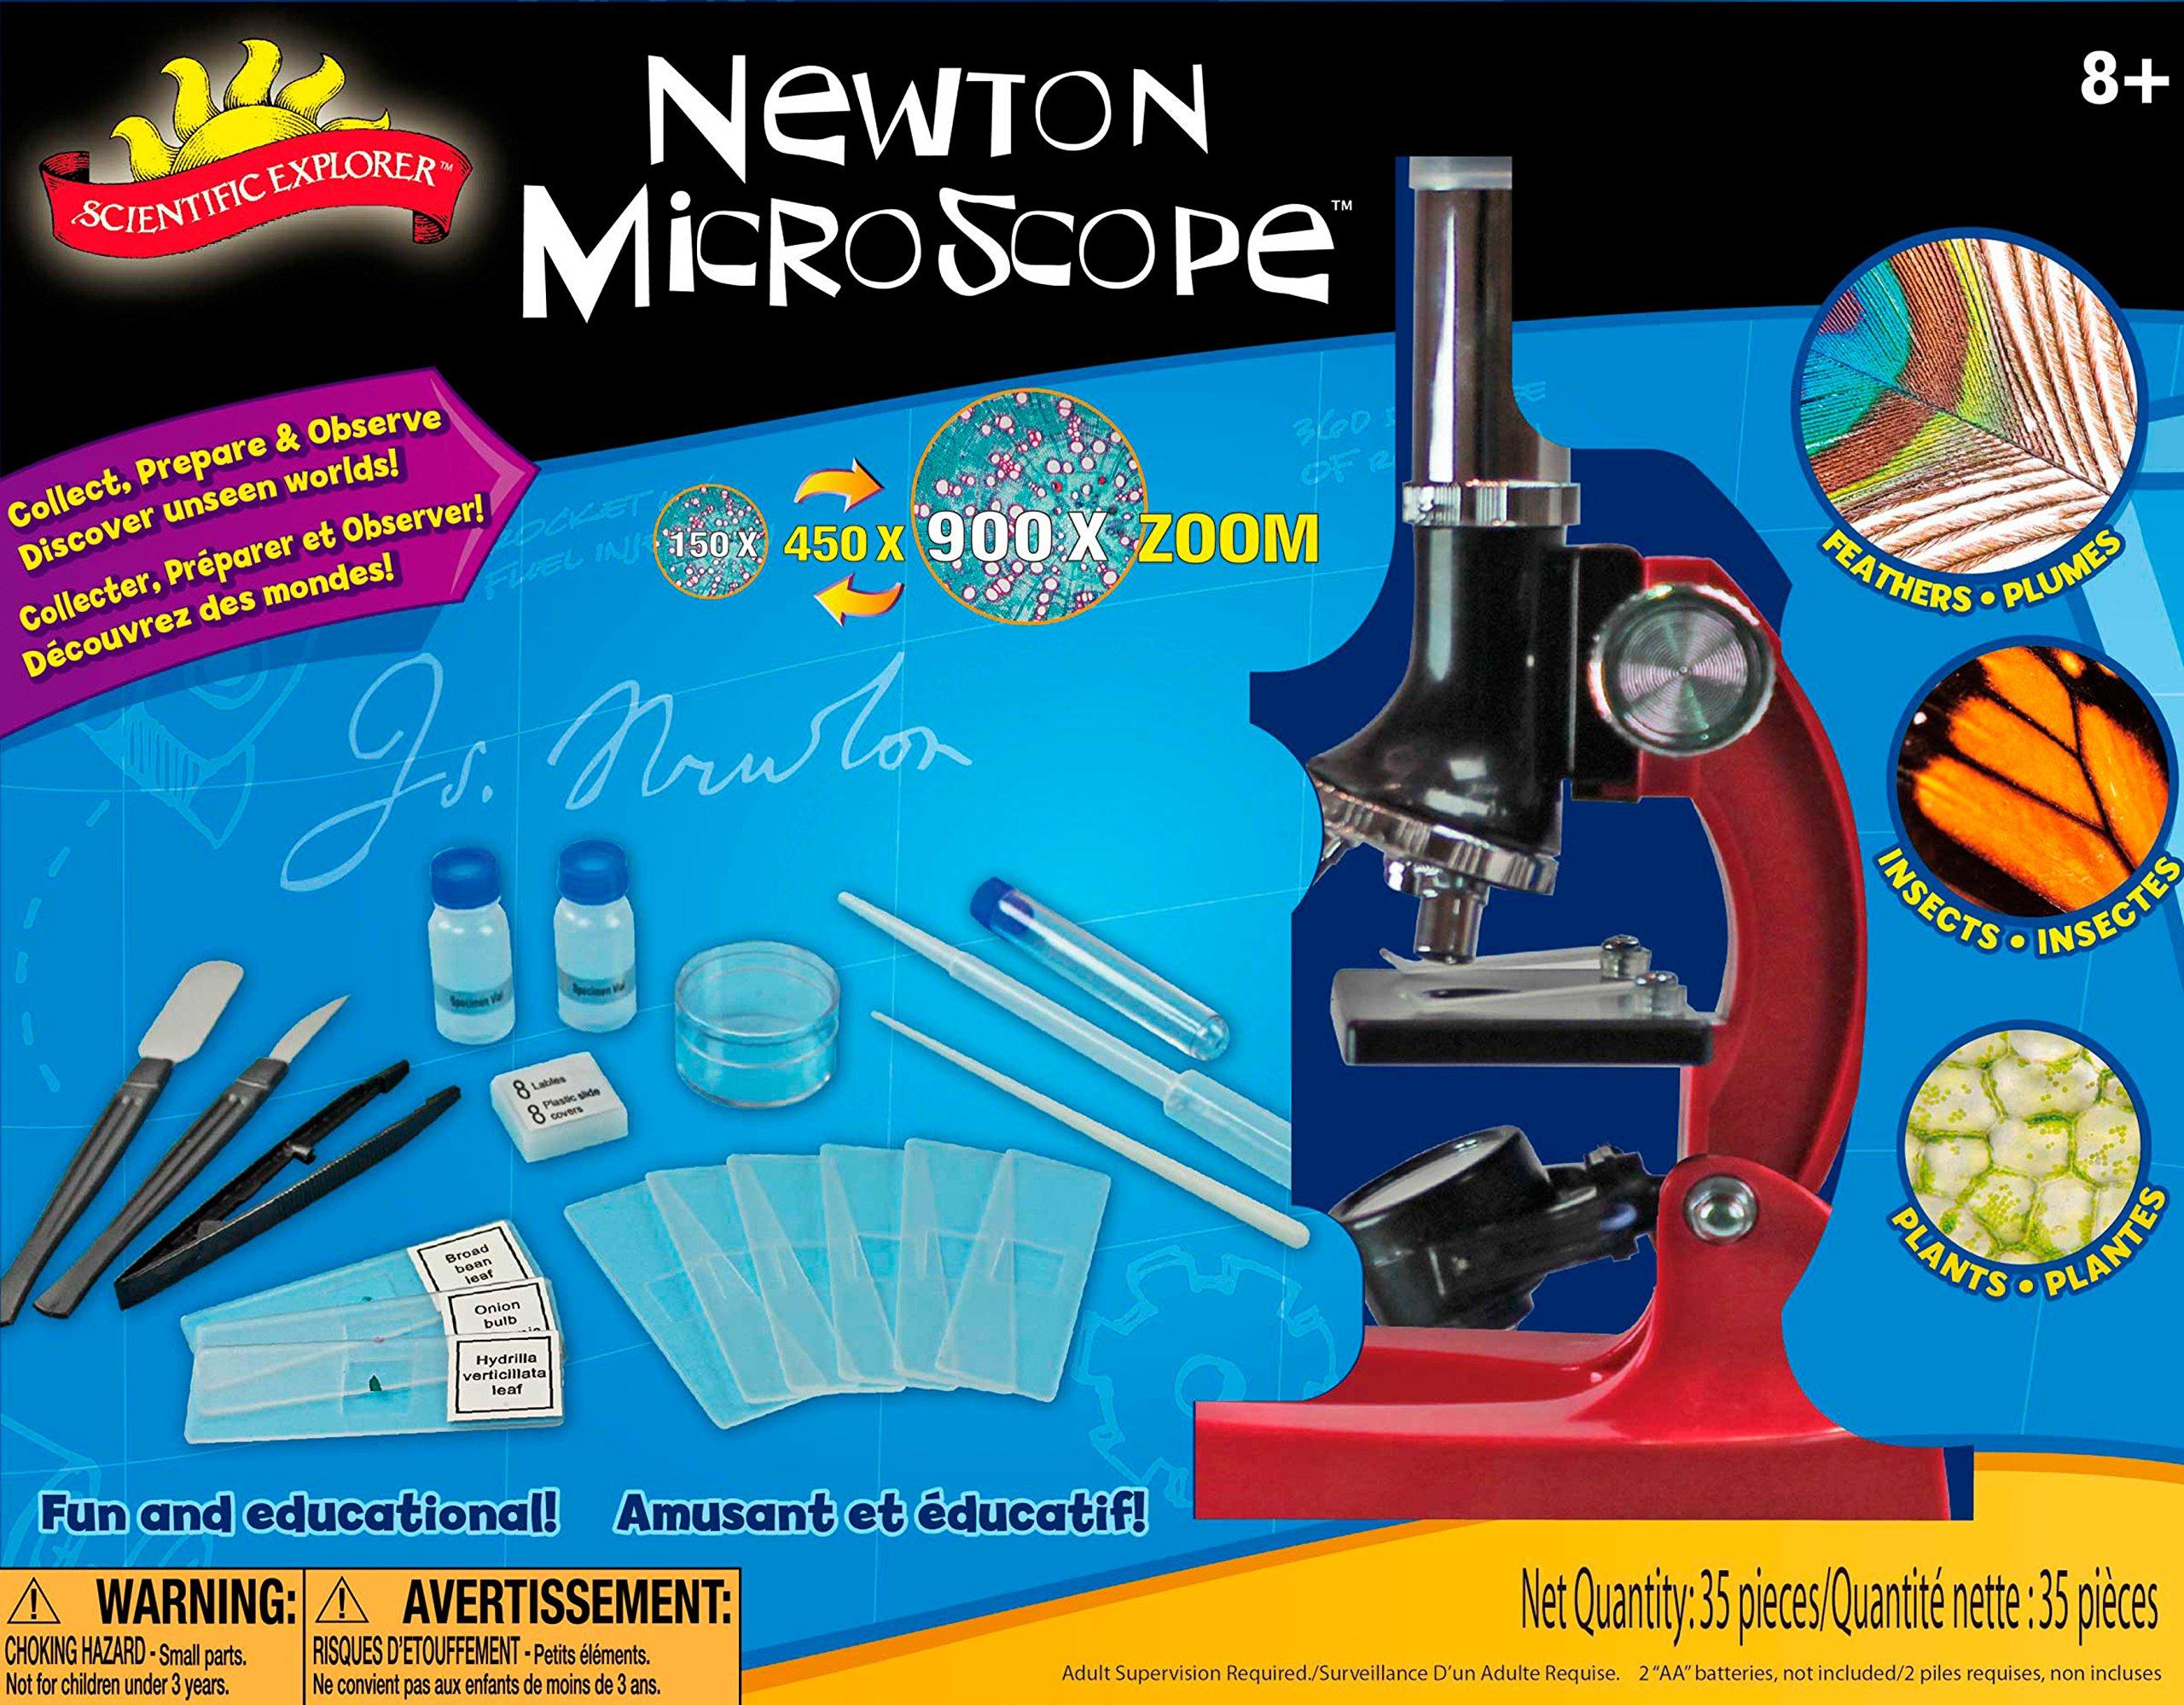 Scientific Explorer Newton Microscope by Scientific Explorer